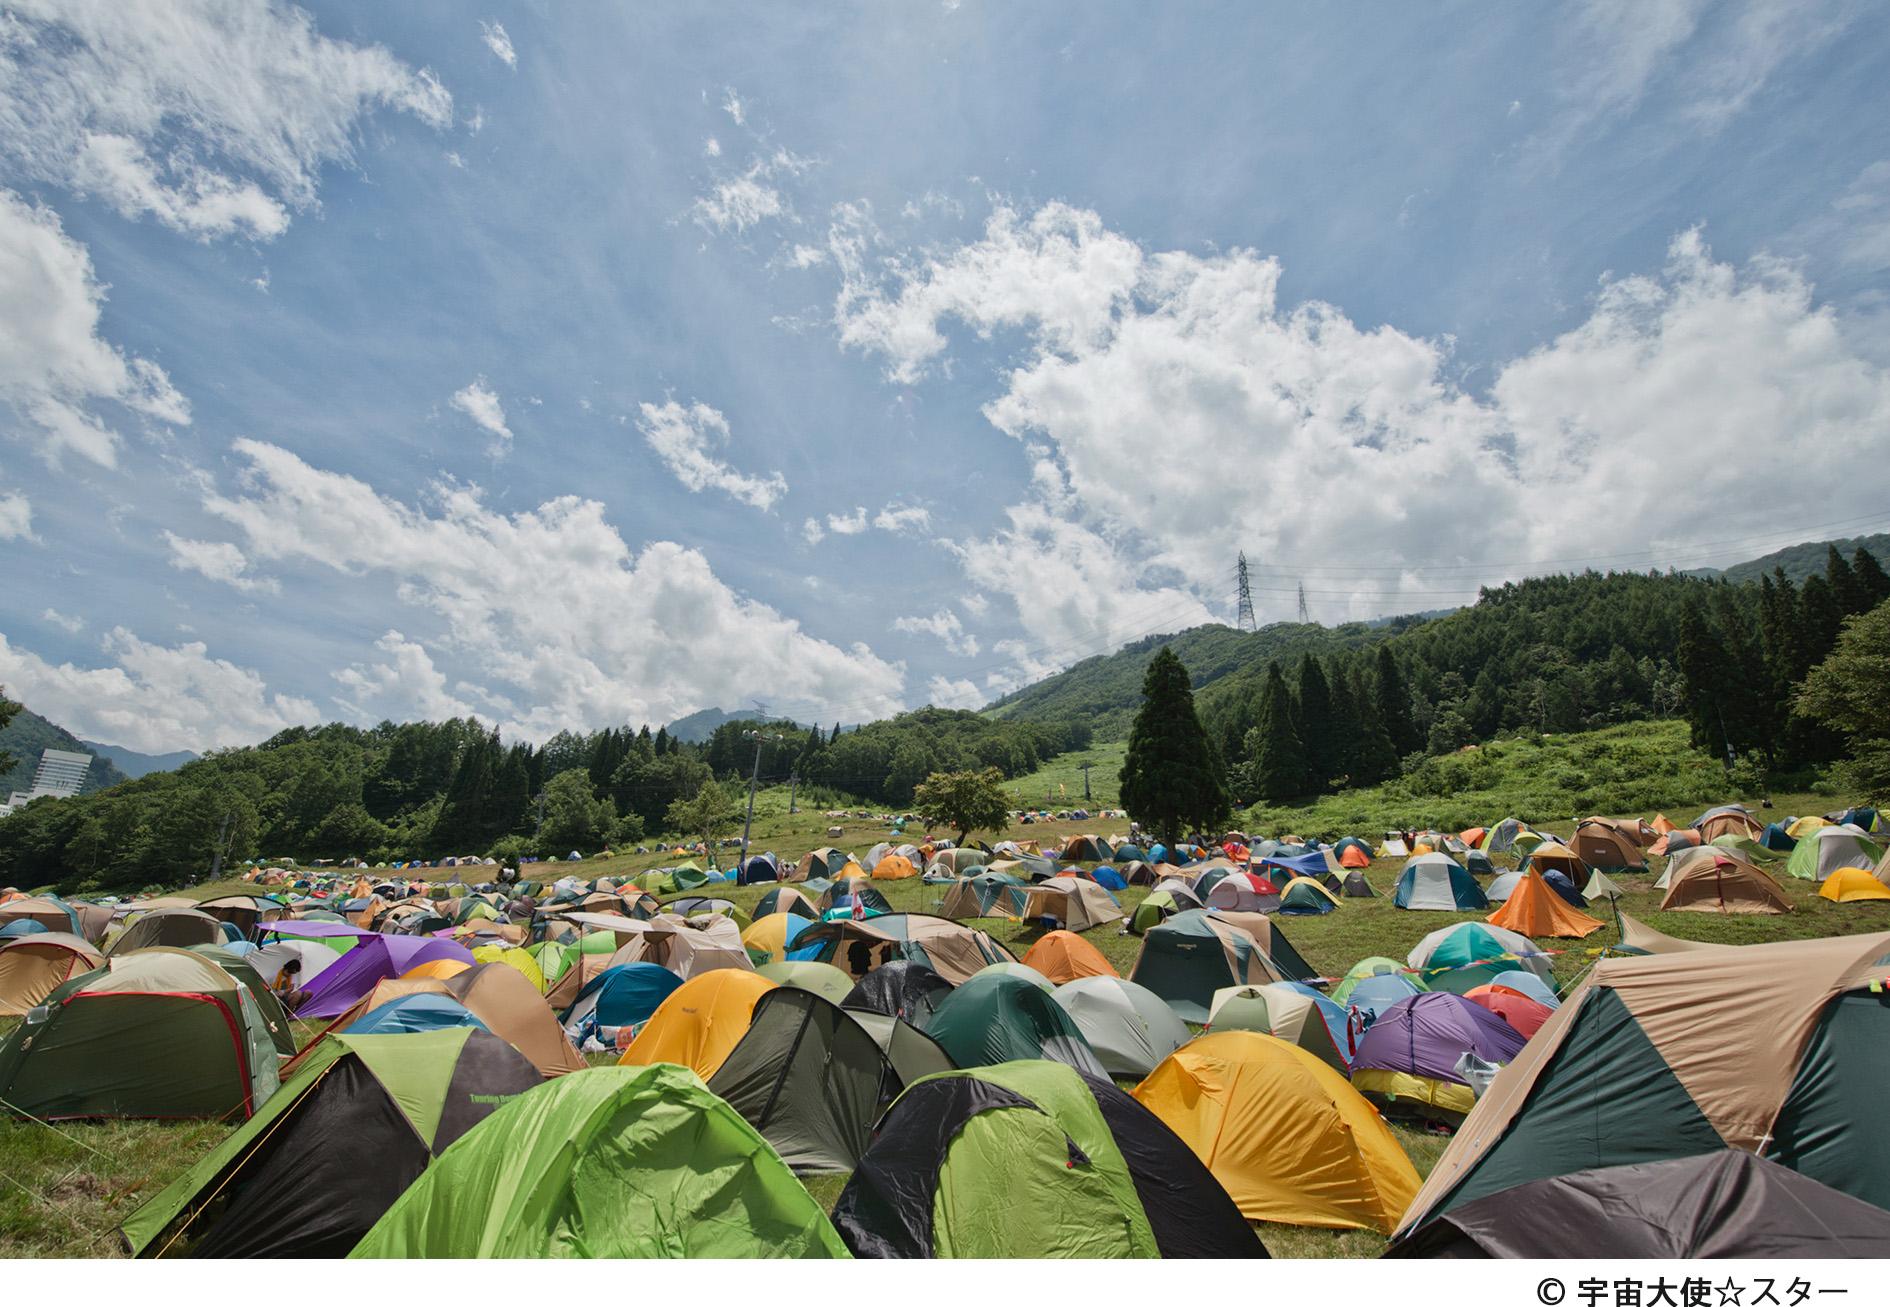 camp_site フジロック生みの親、日高正博氏インタビュー 『後編:フジロック ついに約束の地、苗場へ』